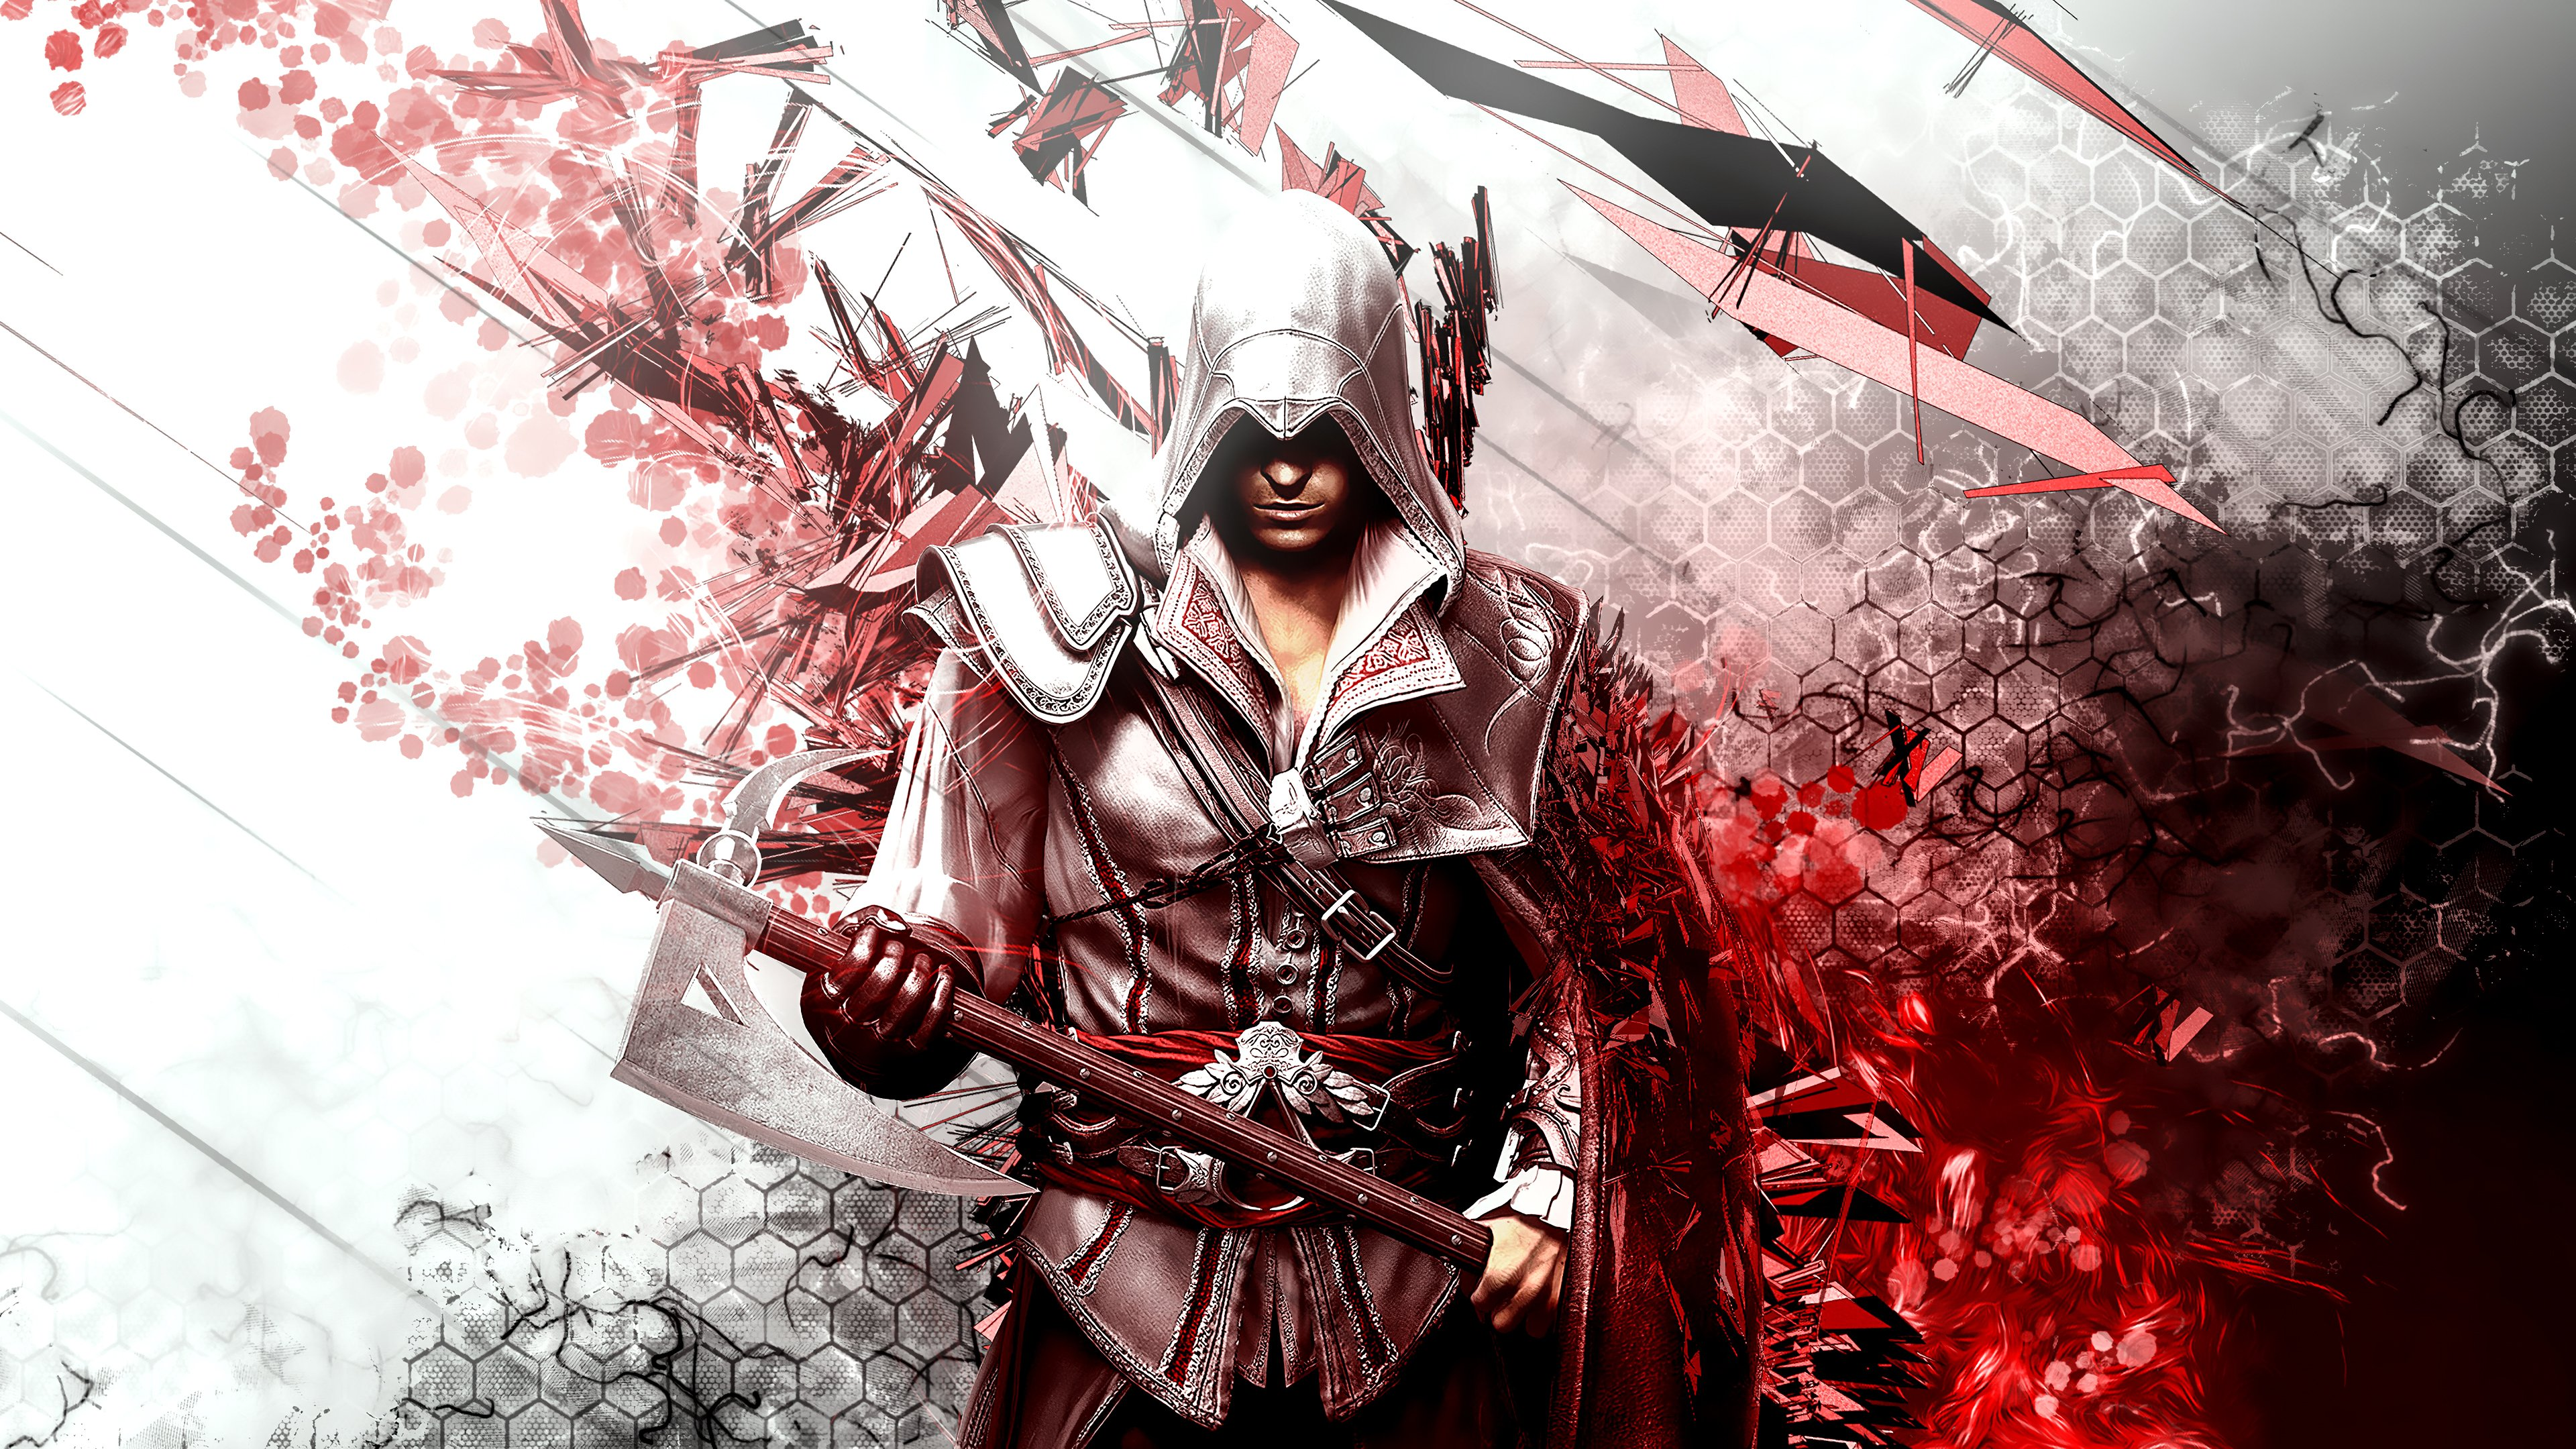 Assassin S Creed Ezio Auditore 4k Wallpaper Syanart Station